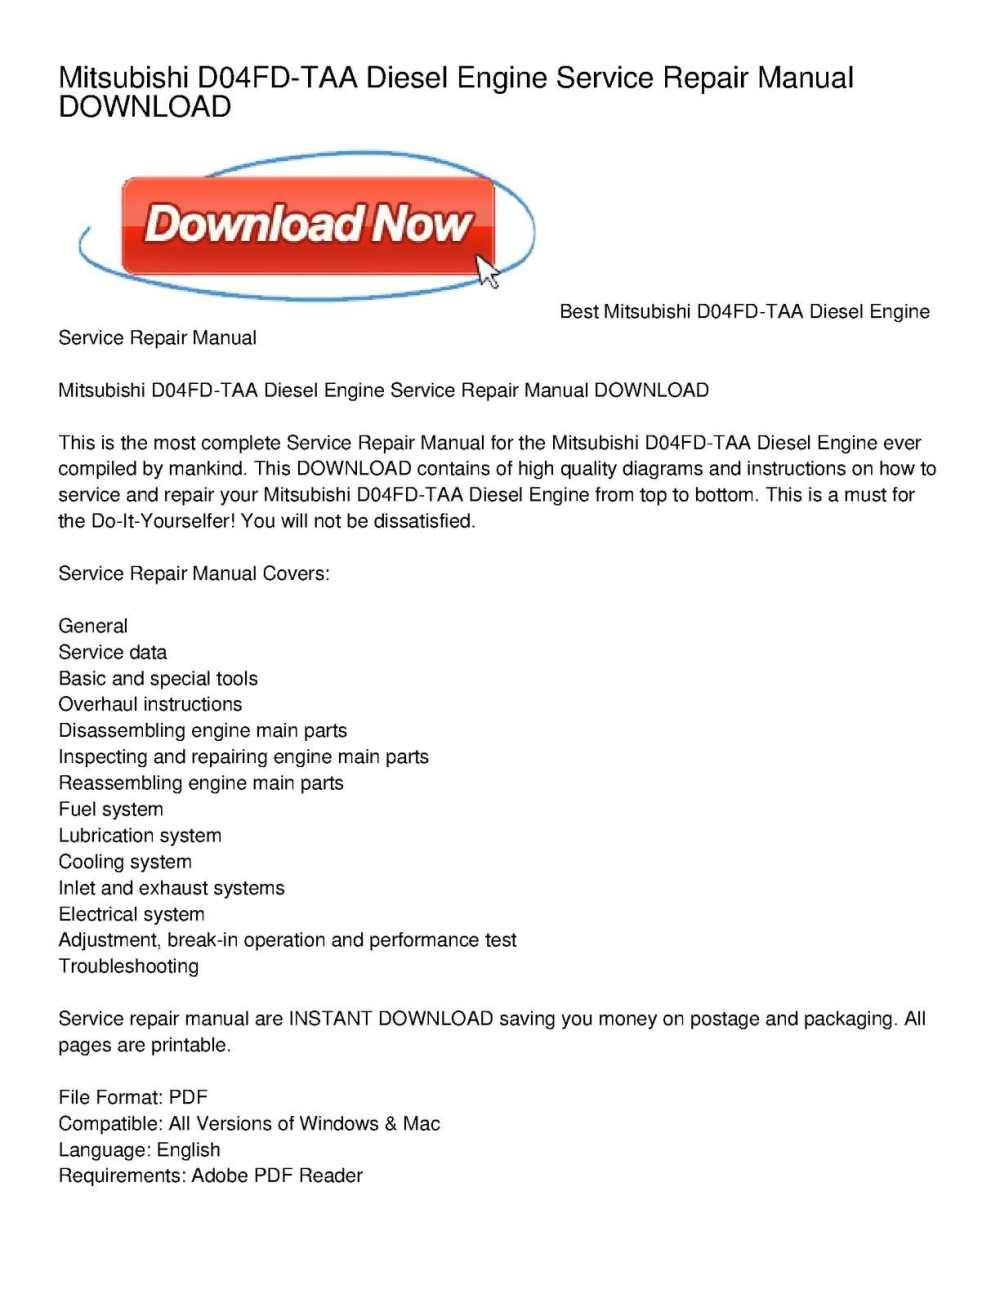 medium resolution of mitsubishi d04fd taa diesel engine service repair manual download